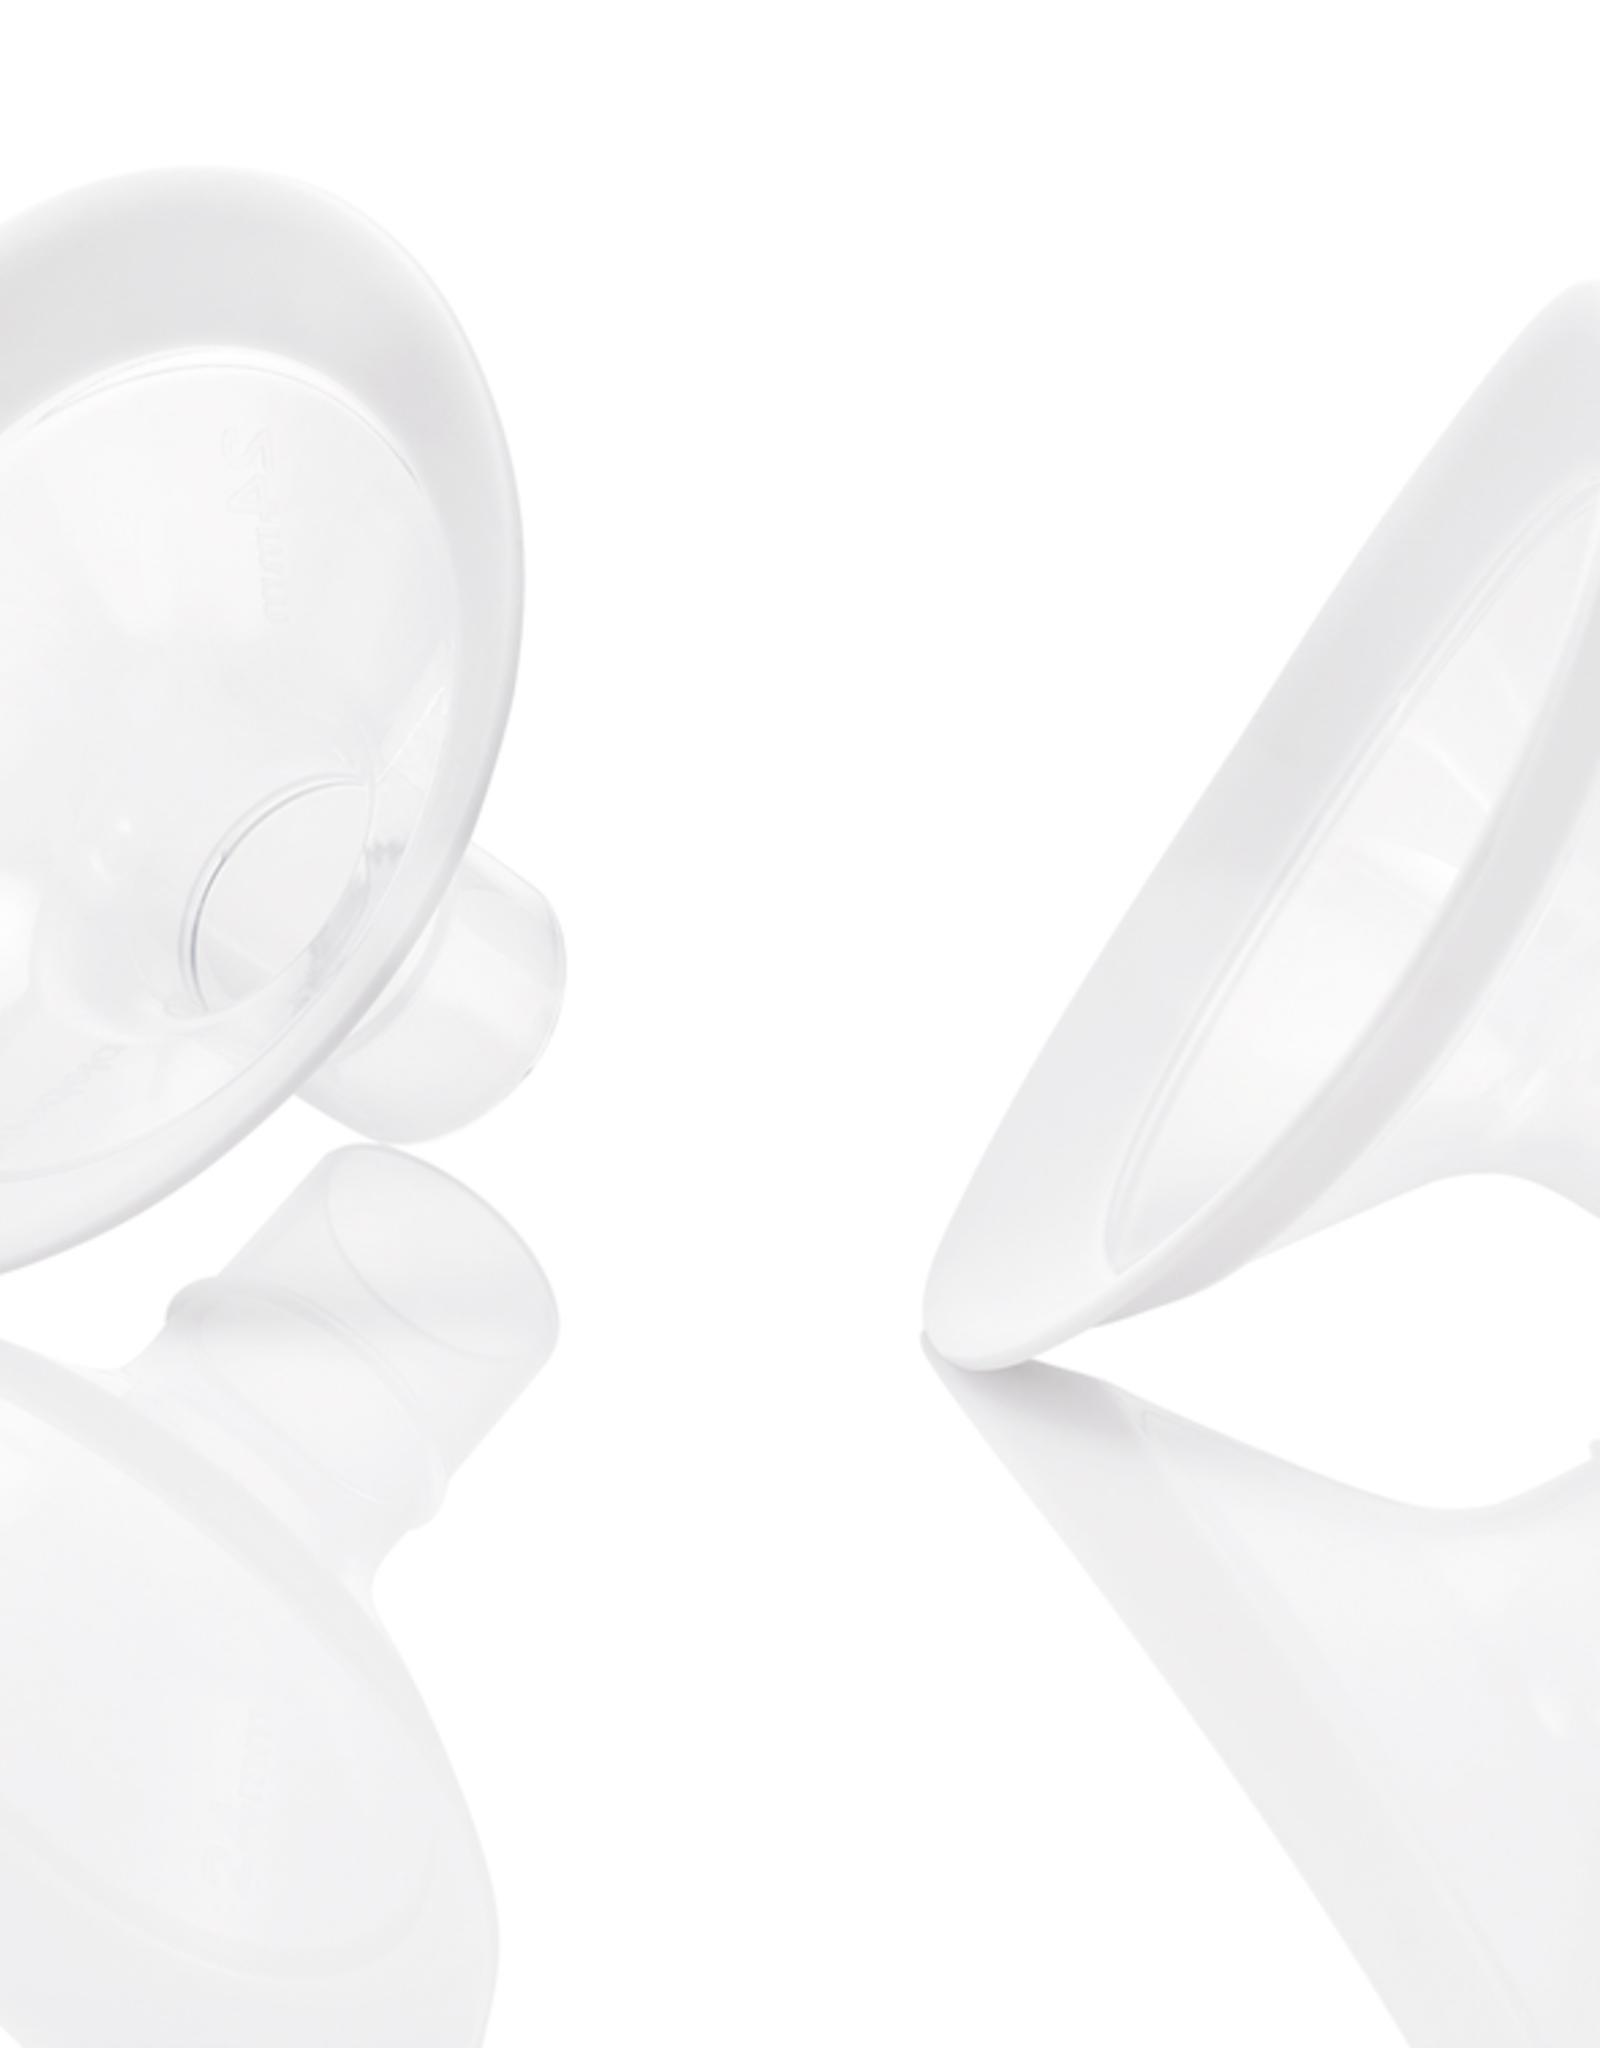 Medela PersonalFit Flex™ Breast Shields